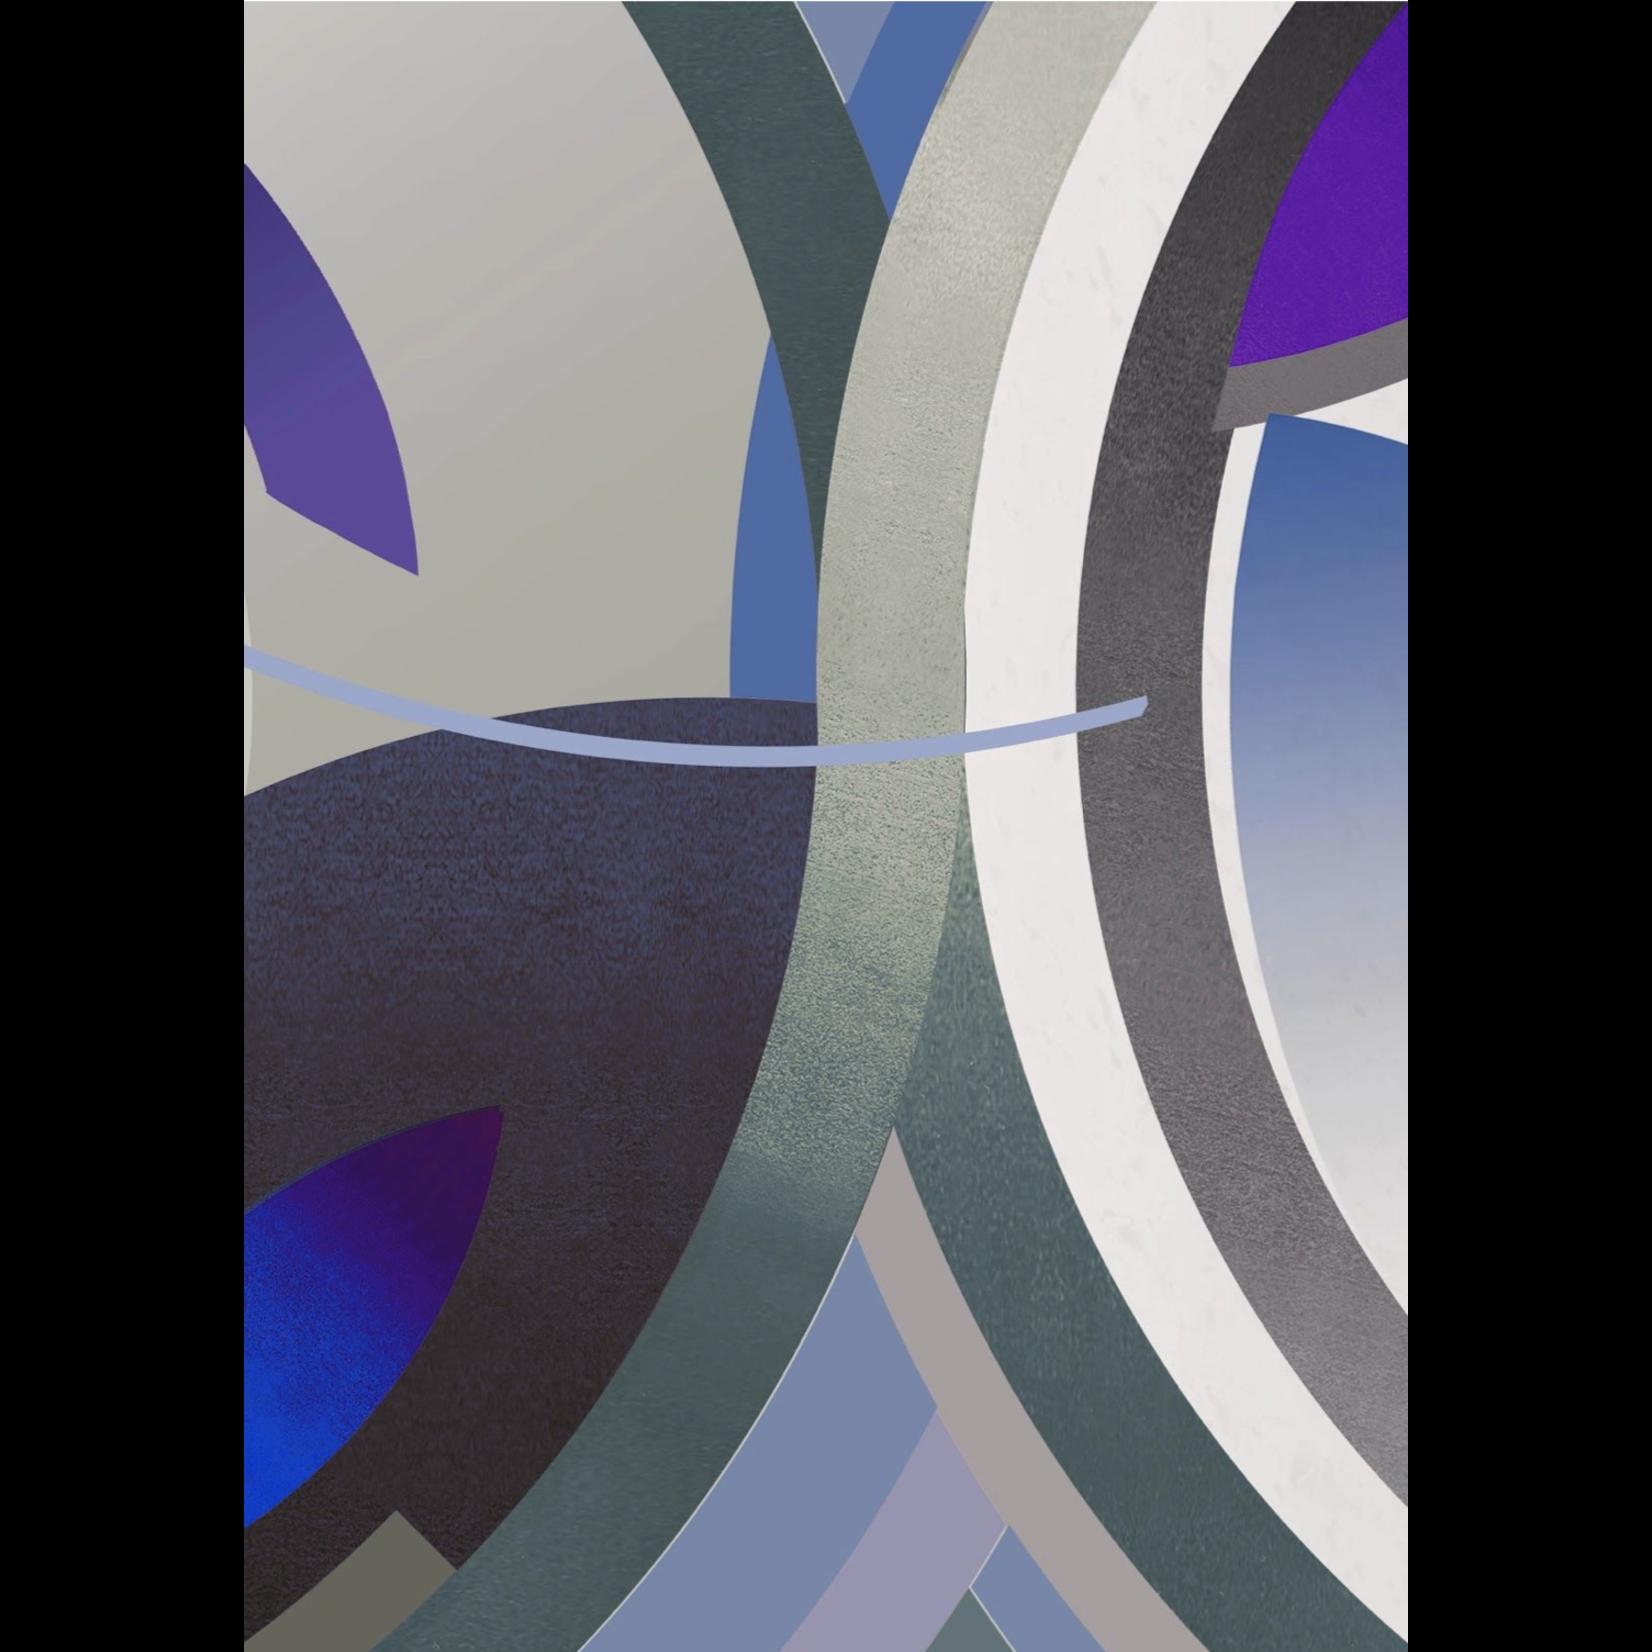 Kit Miles Les cylindres | Majorelle Blue